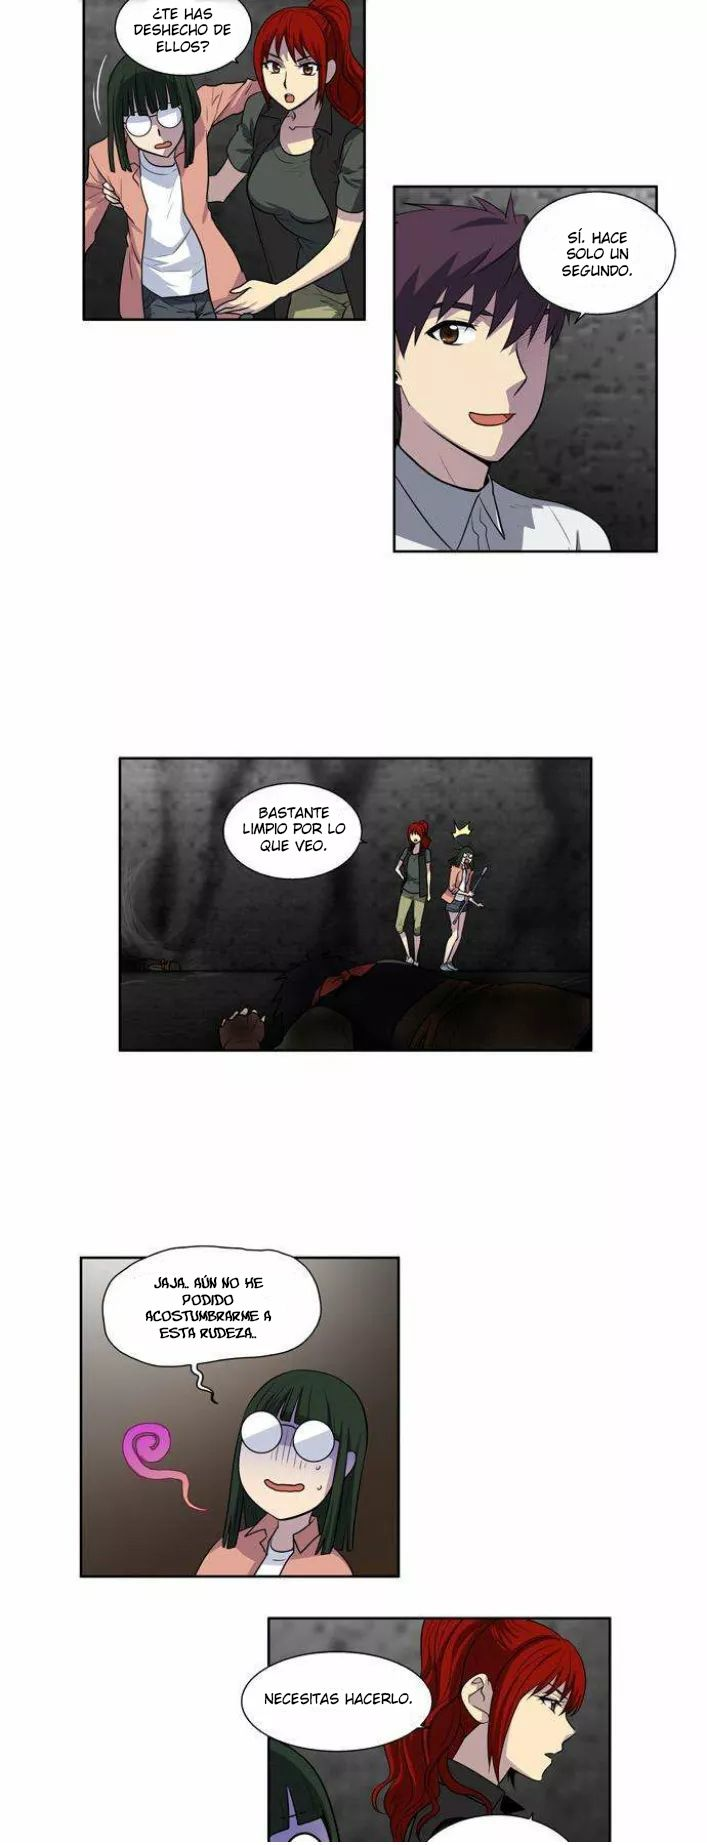 https://c5.ninemanga.com/es_manga/61/1725/484924/6e18b12a82c40871803b88fa42cc1a20.jpg Page 6